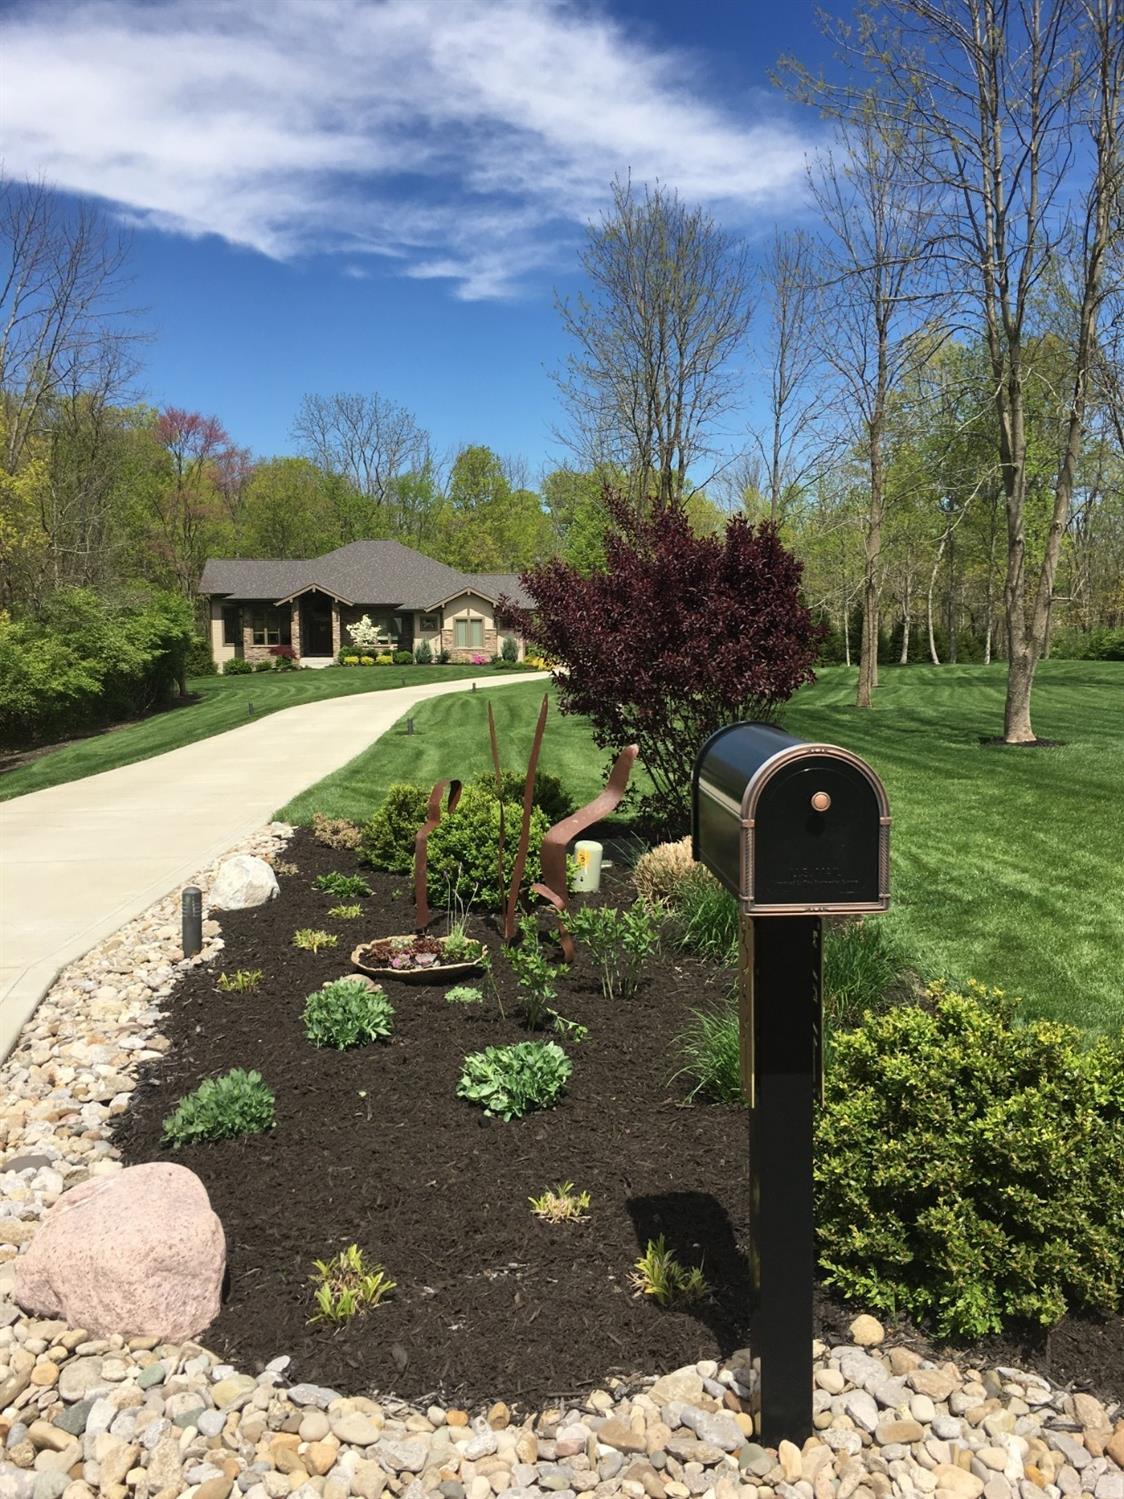 Property for sale at 351 Aspen Ridge Drive, Turtle Creek Twp,  Ohio 45036